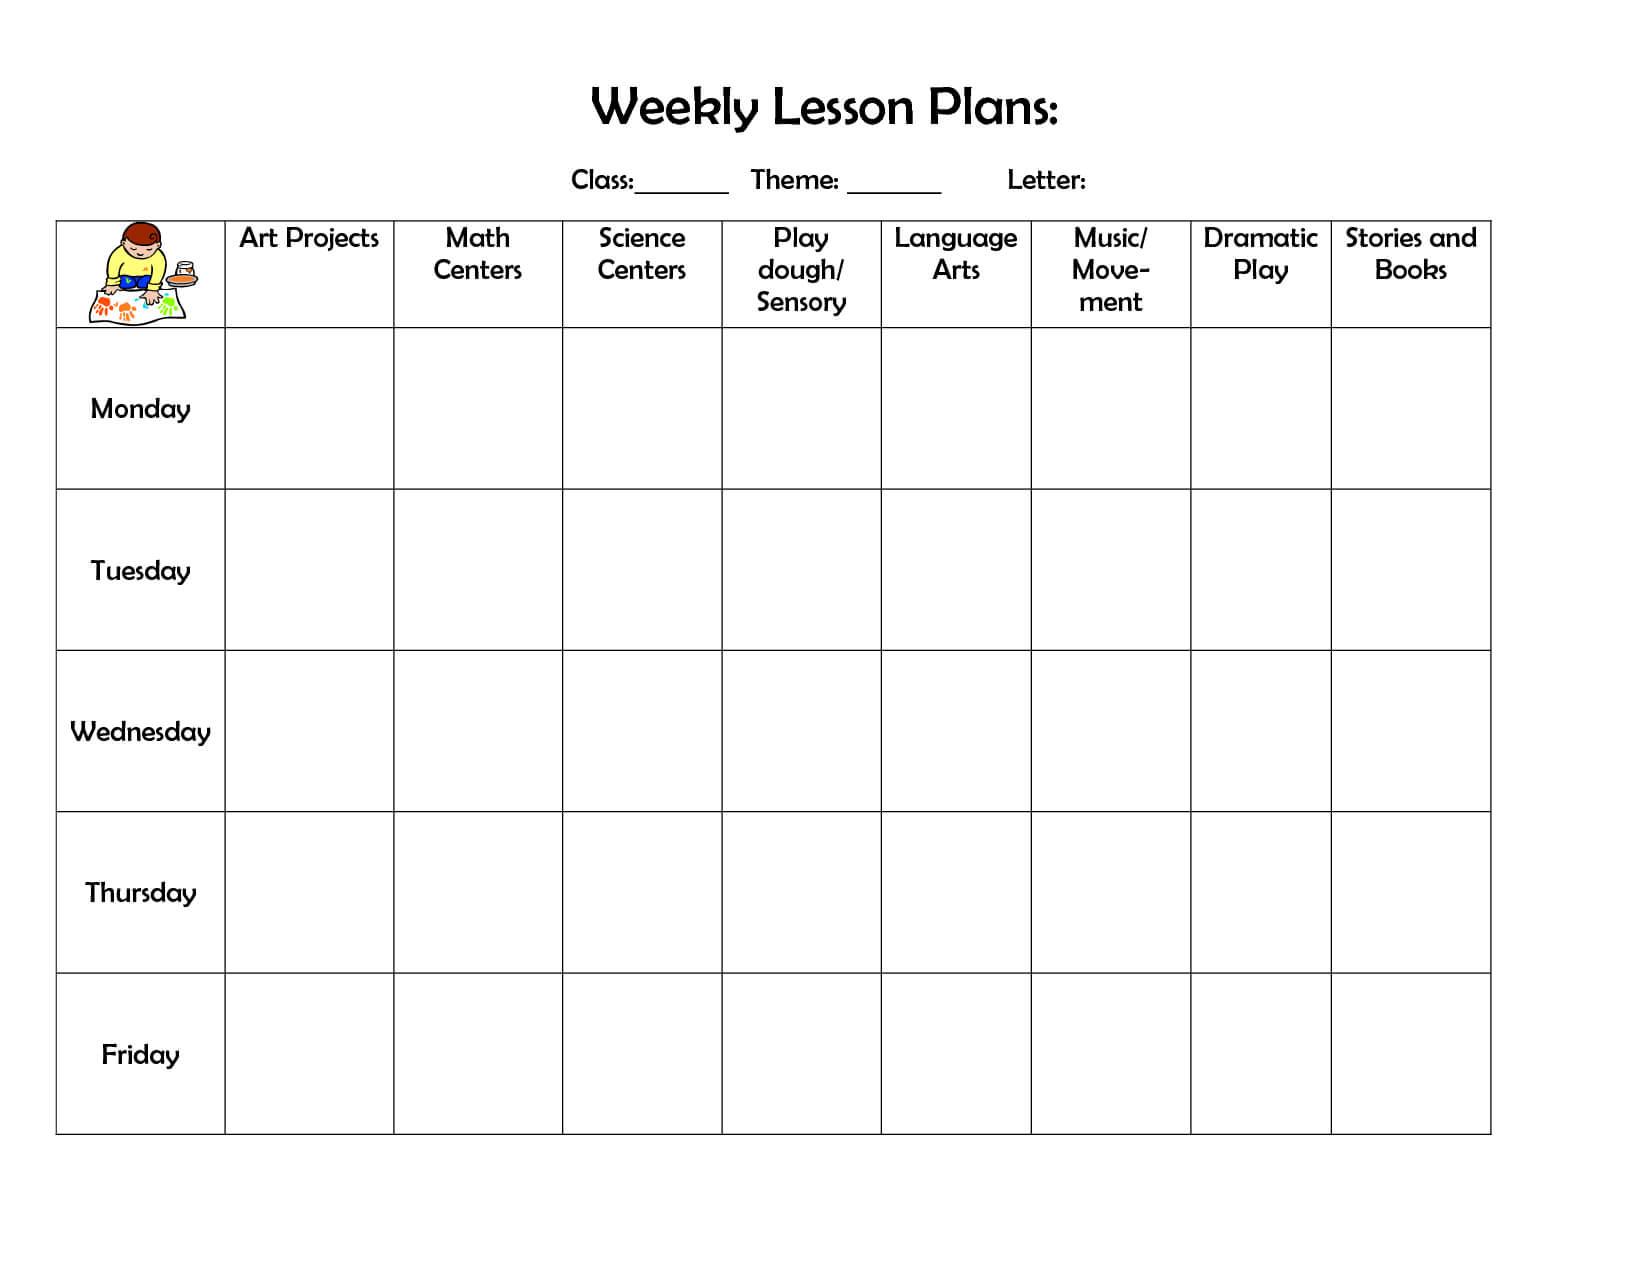 Weekly Lesson Plan | Preschool Lesson Plan Template, Daycare Regarding Blank Preschool Lesson Plan Template